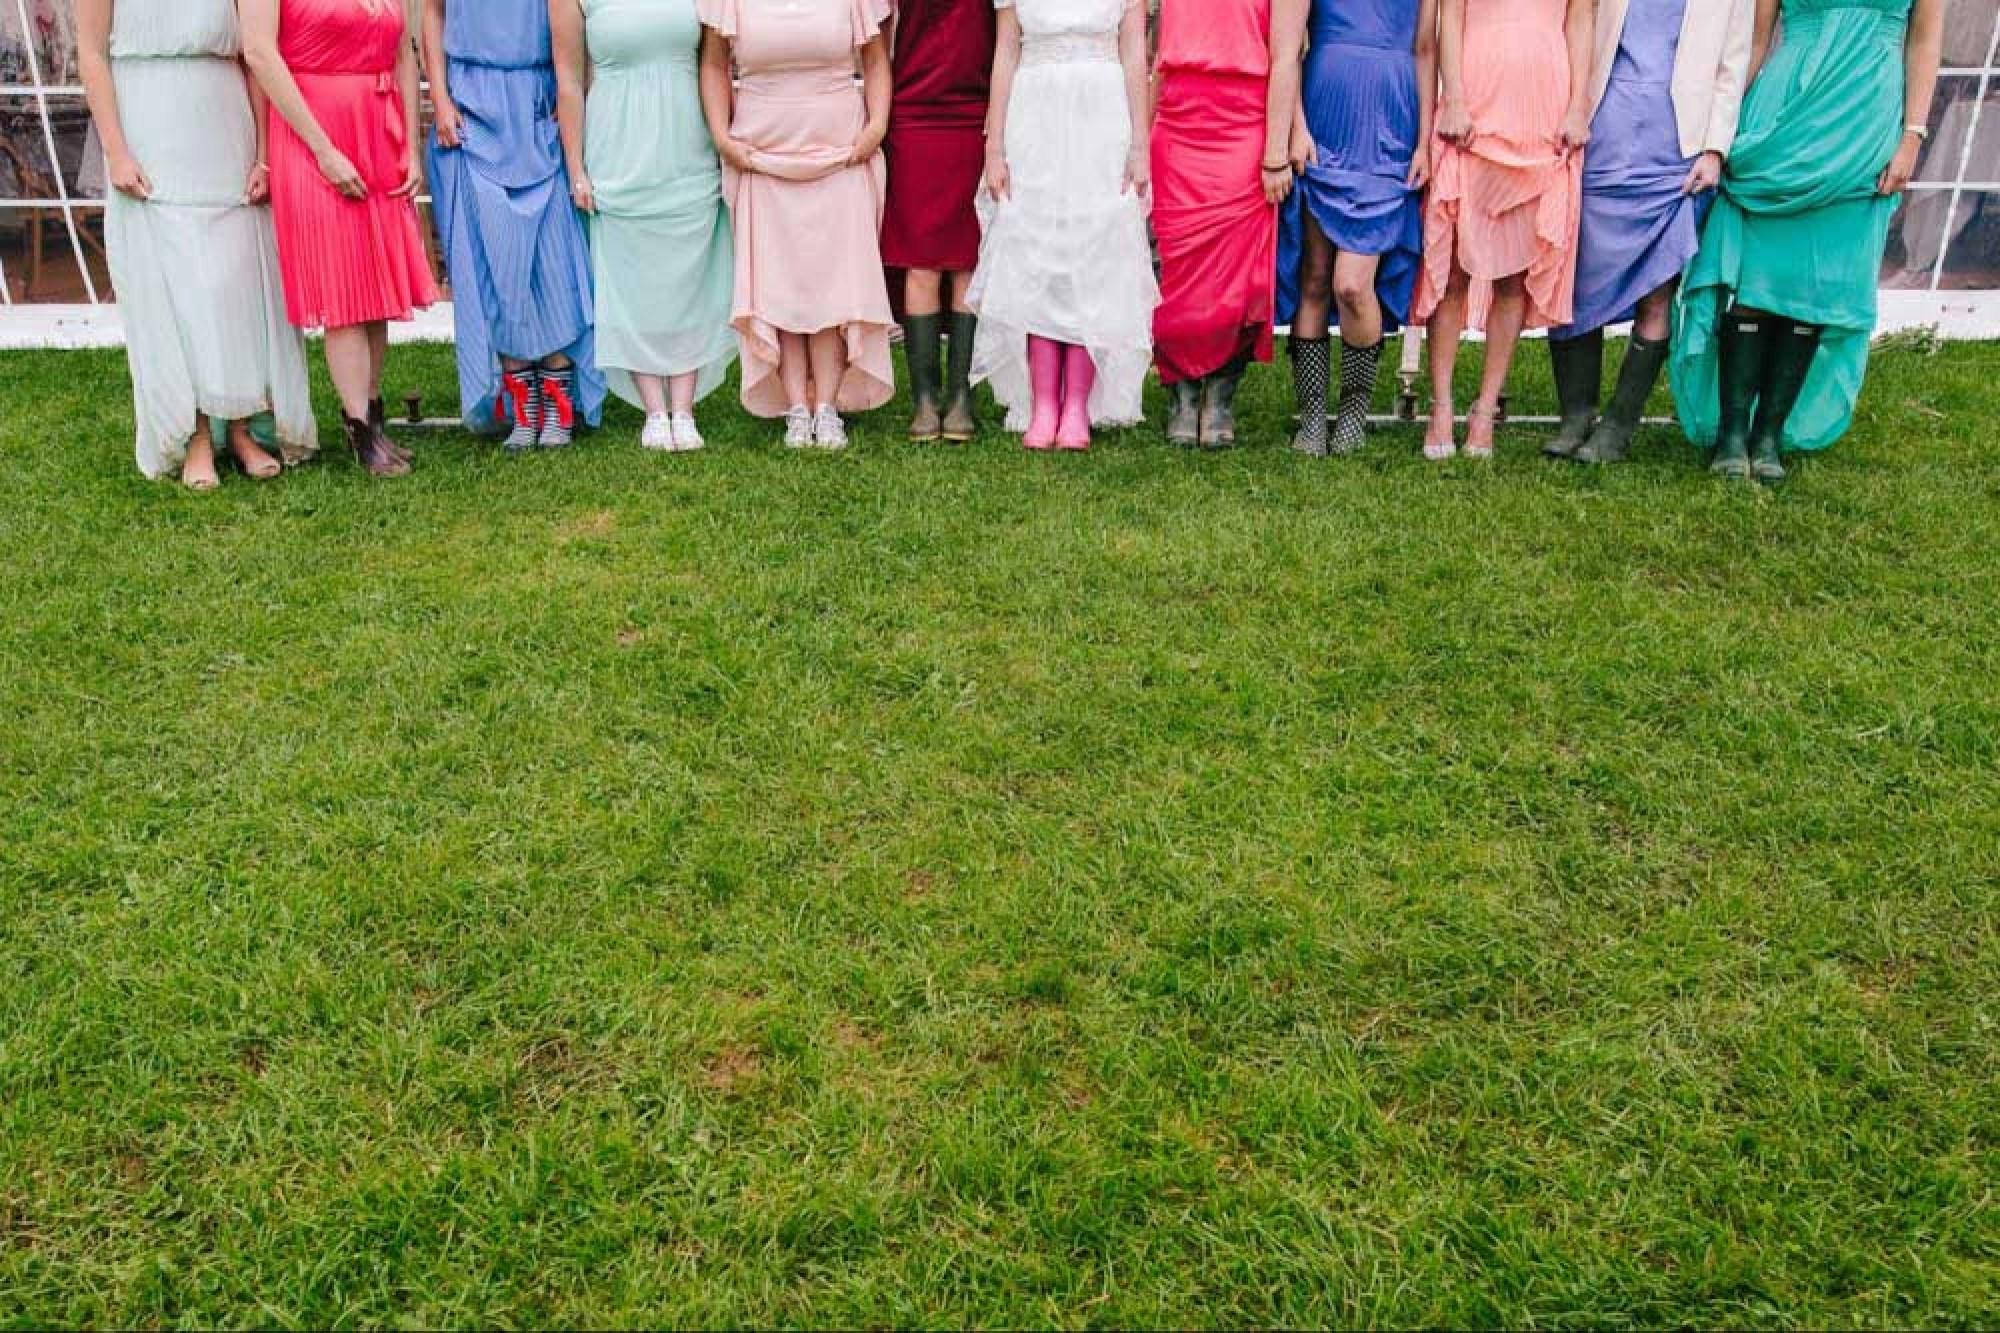 Colourful bridesmaids